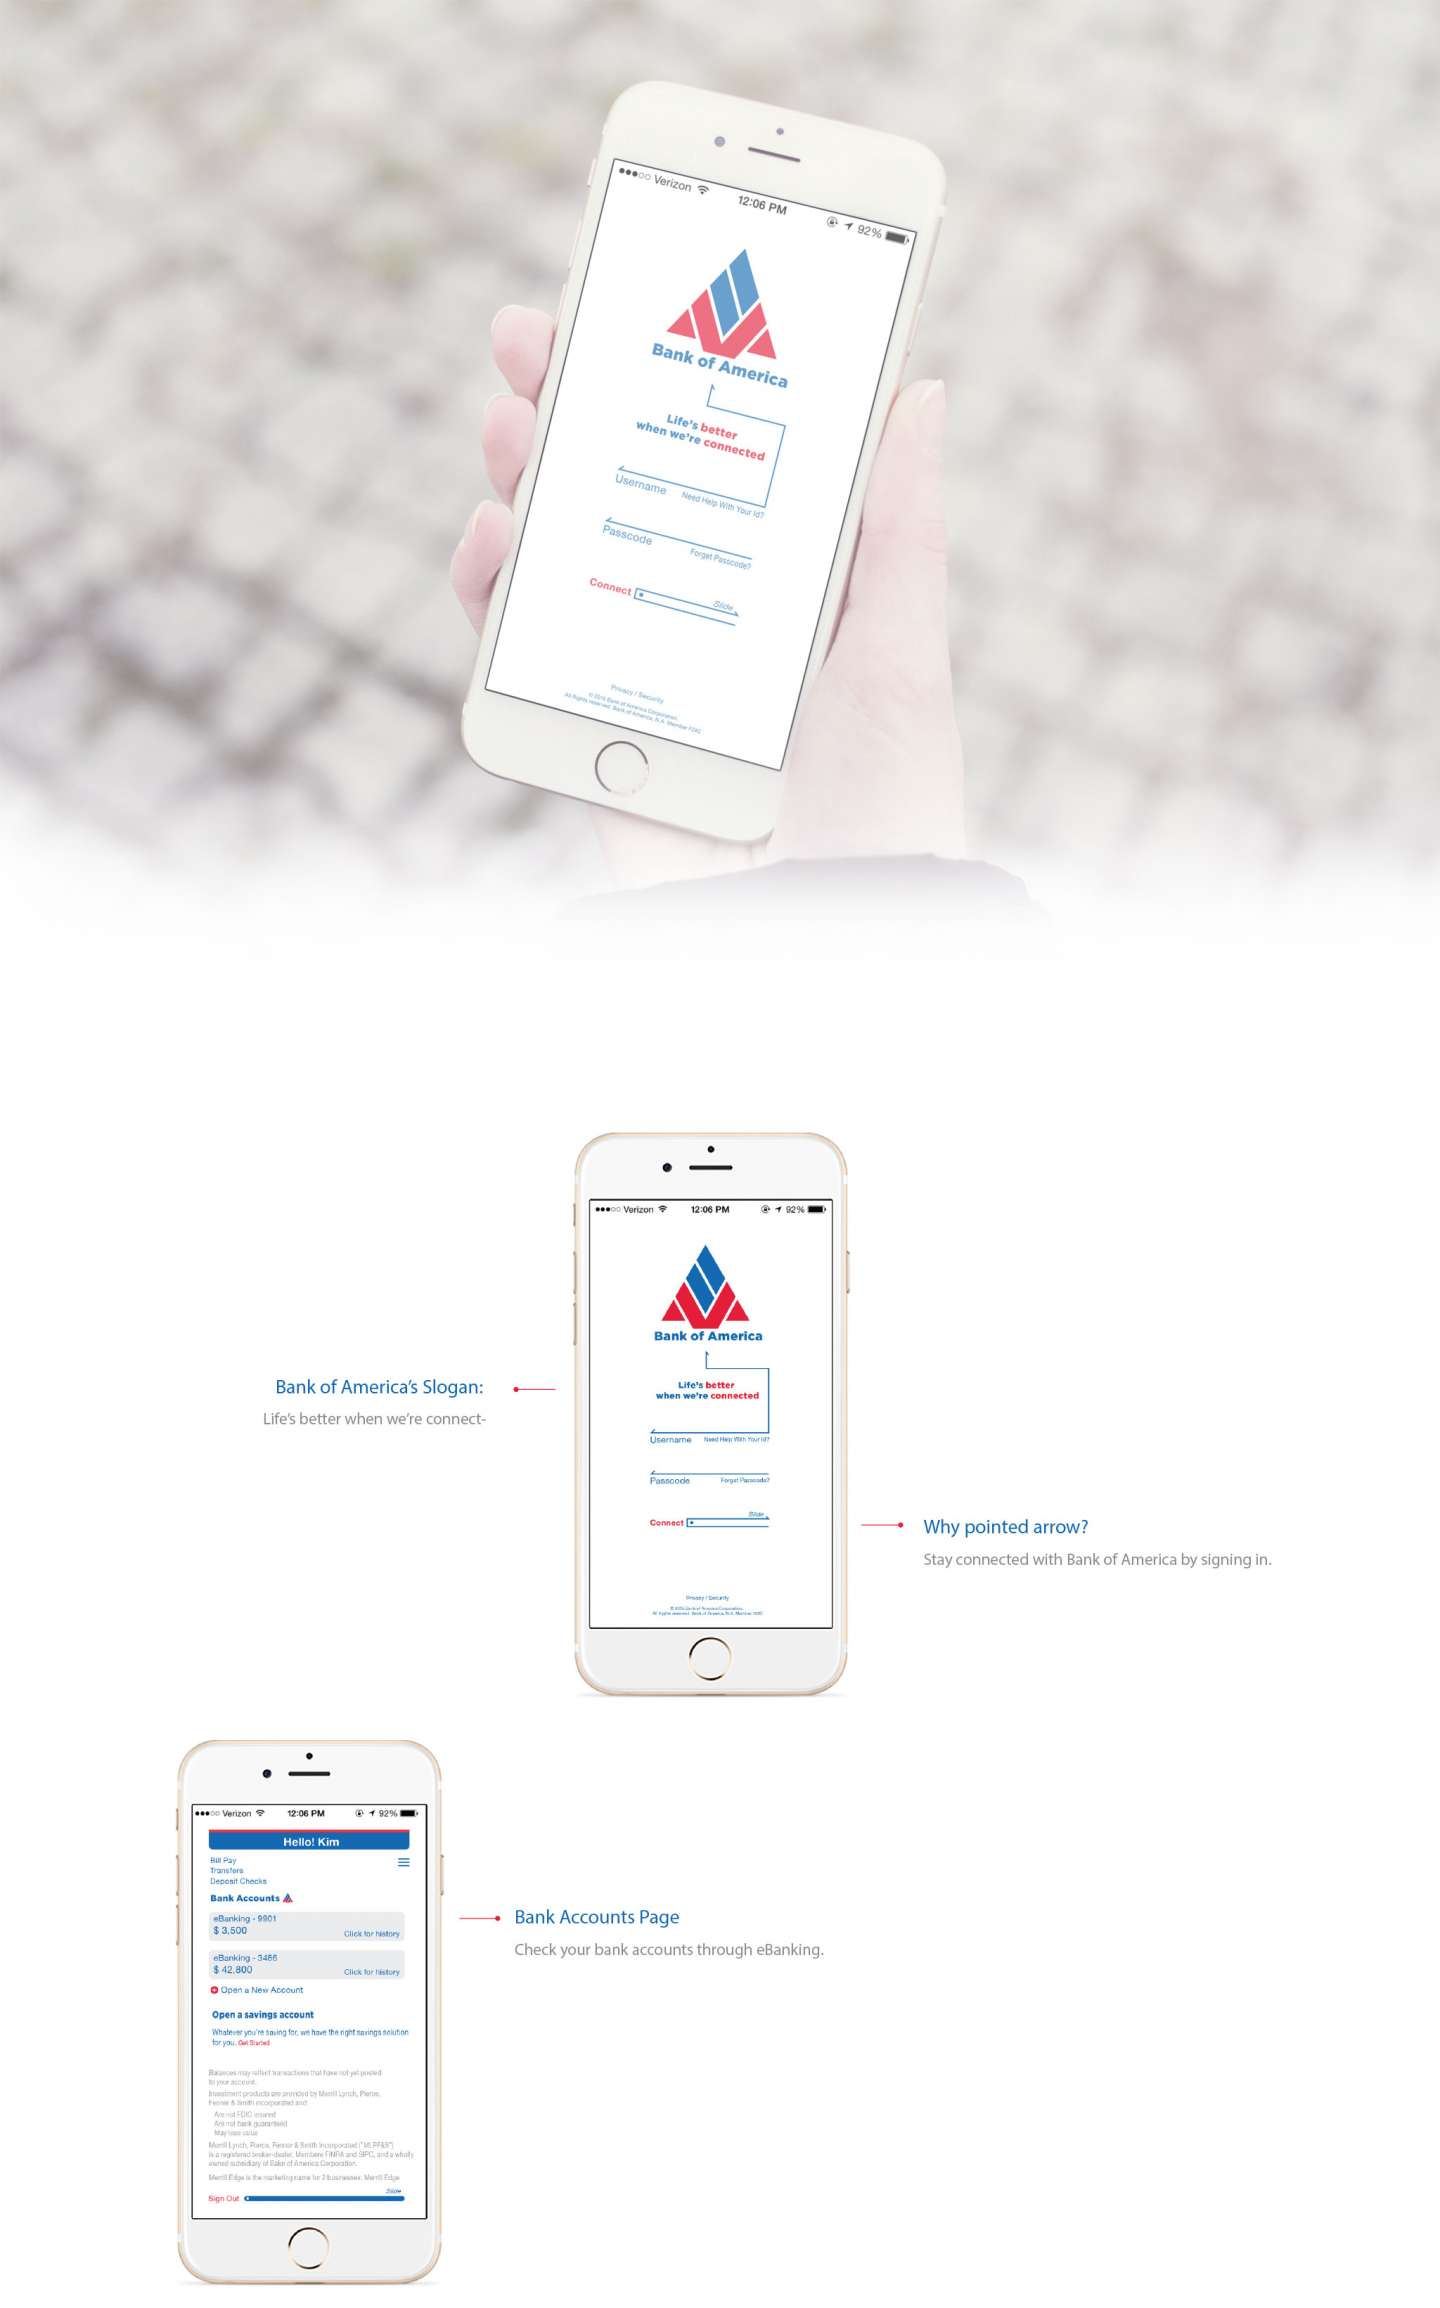 Bank of America Mobile App Redesign by Heera Kim – SVA Design